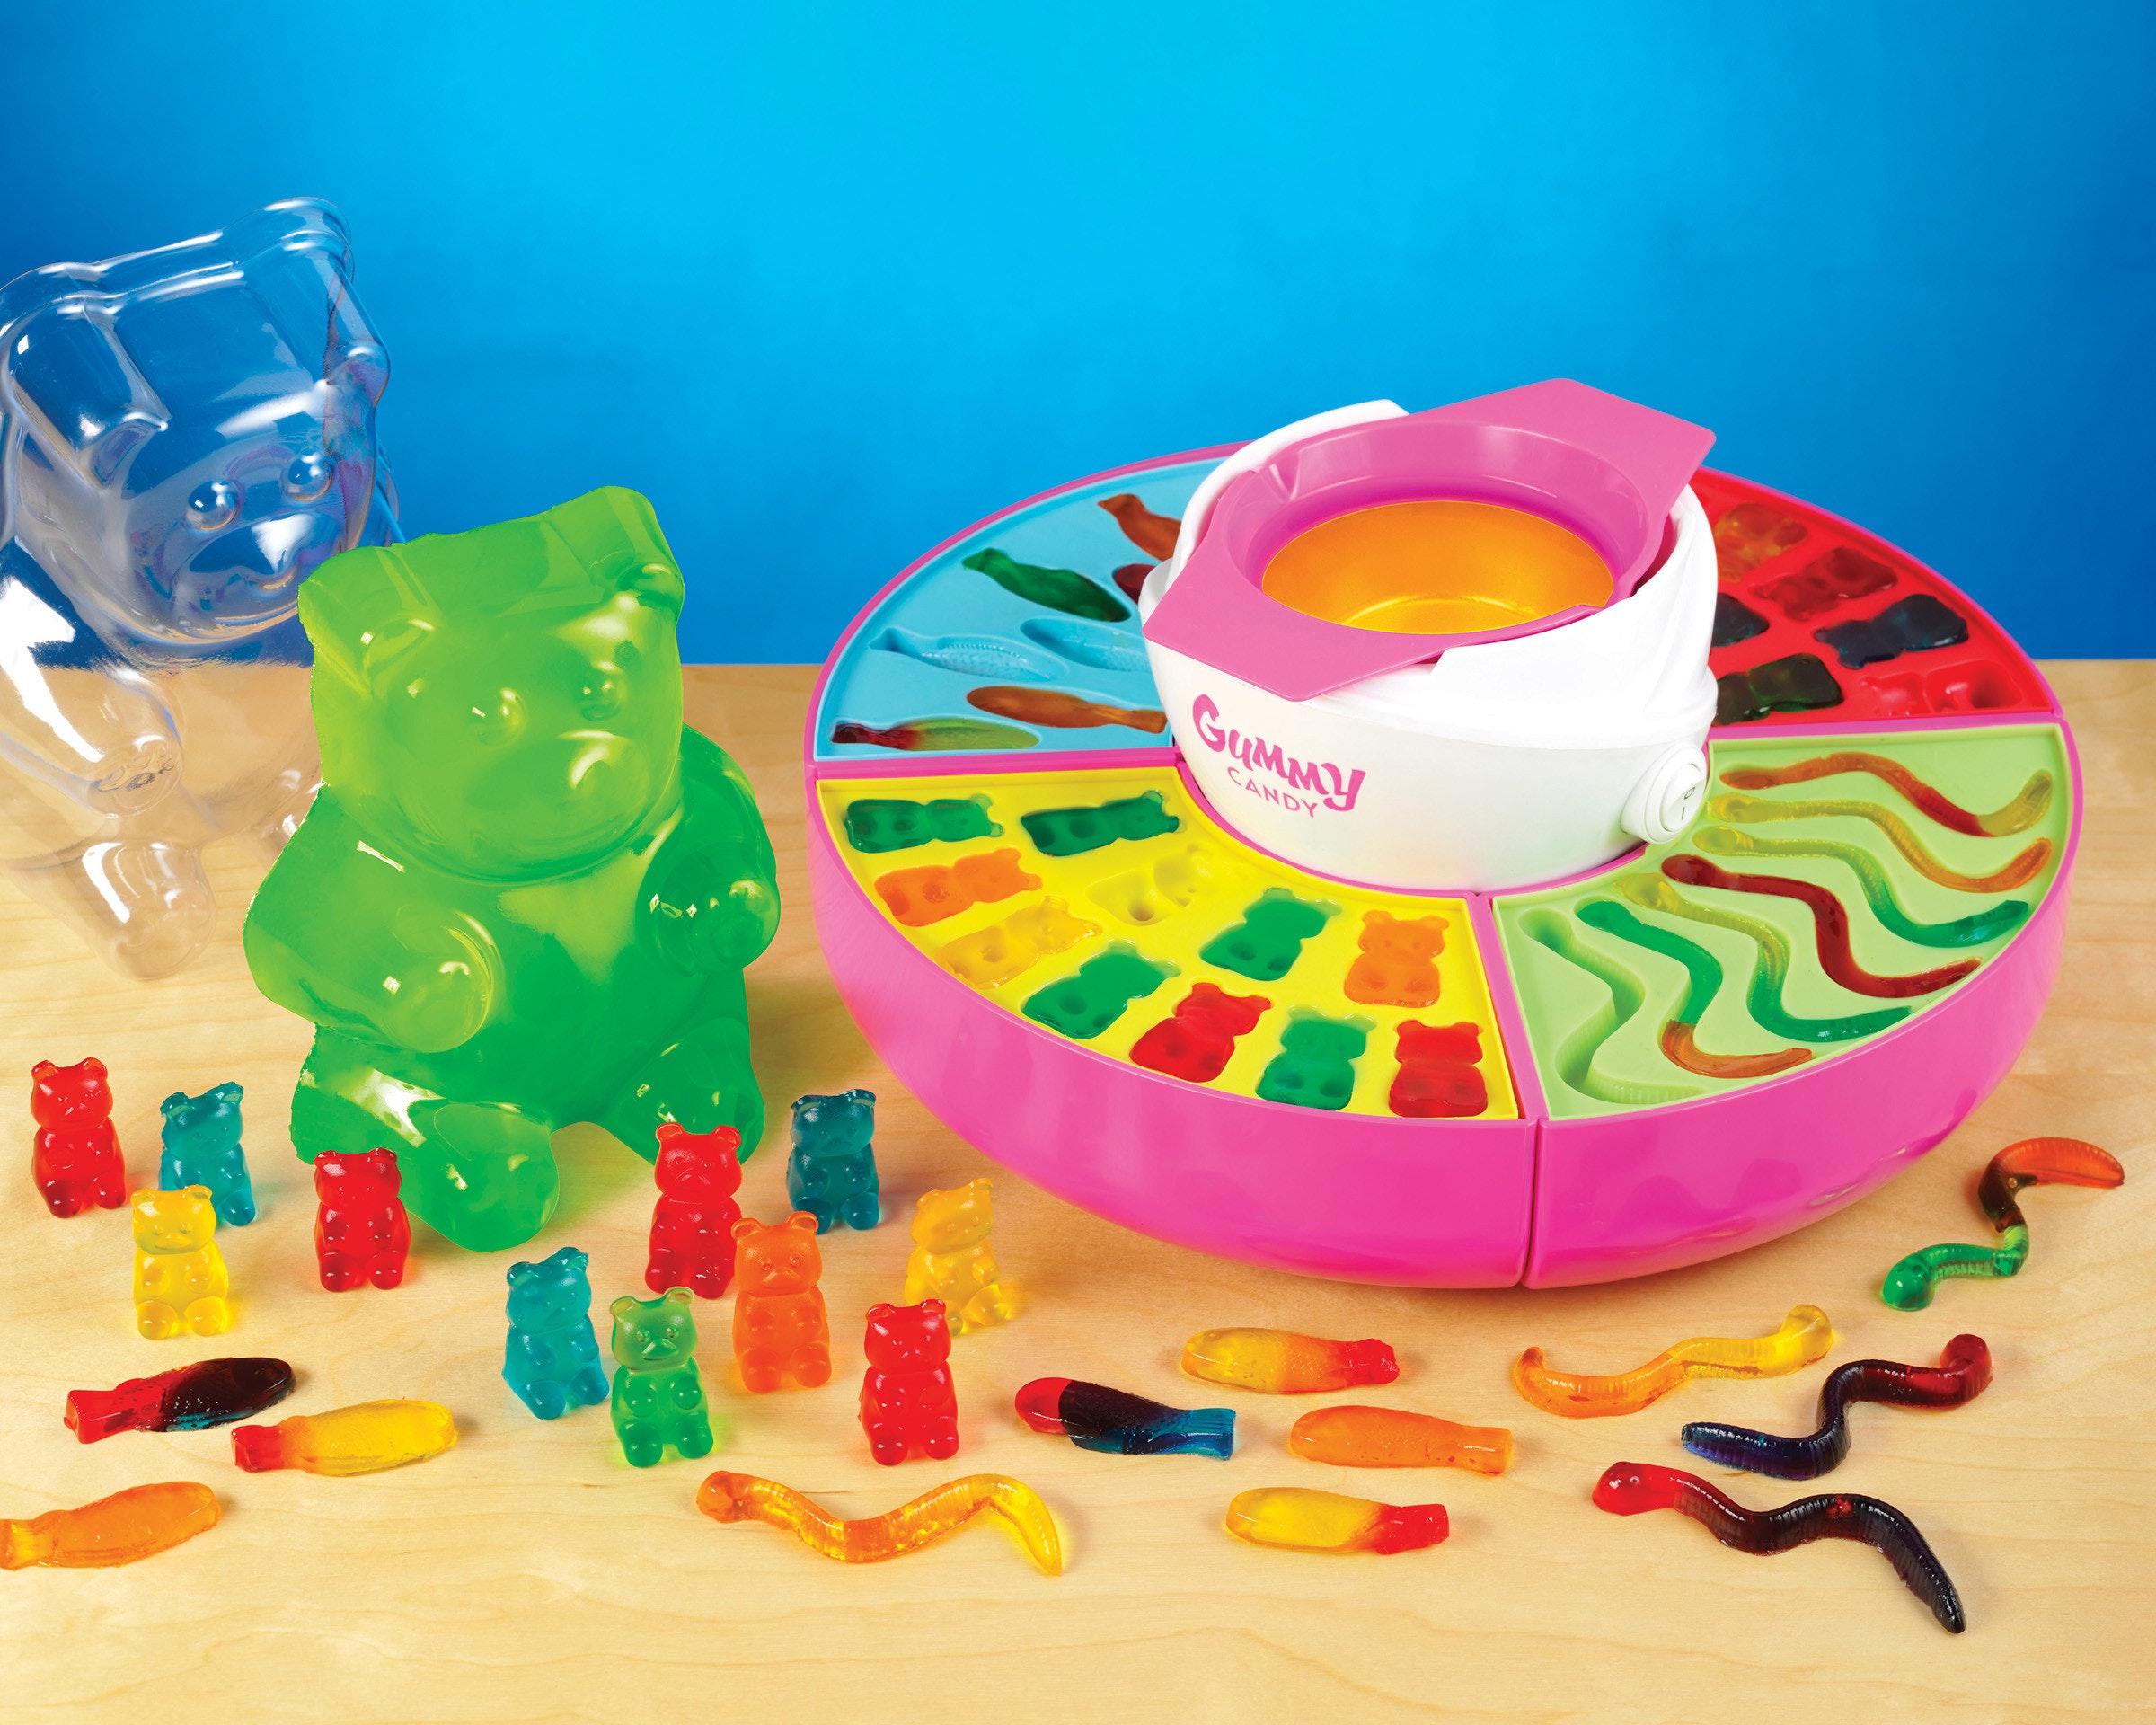 Gummymaker giveaway